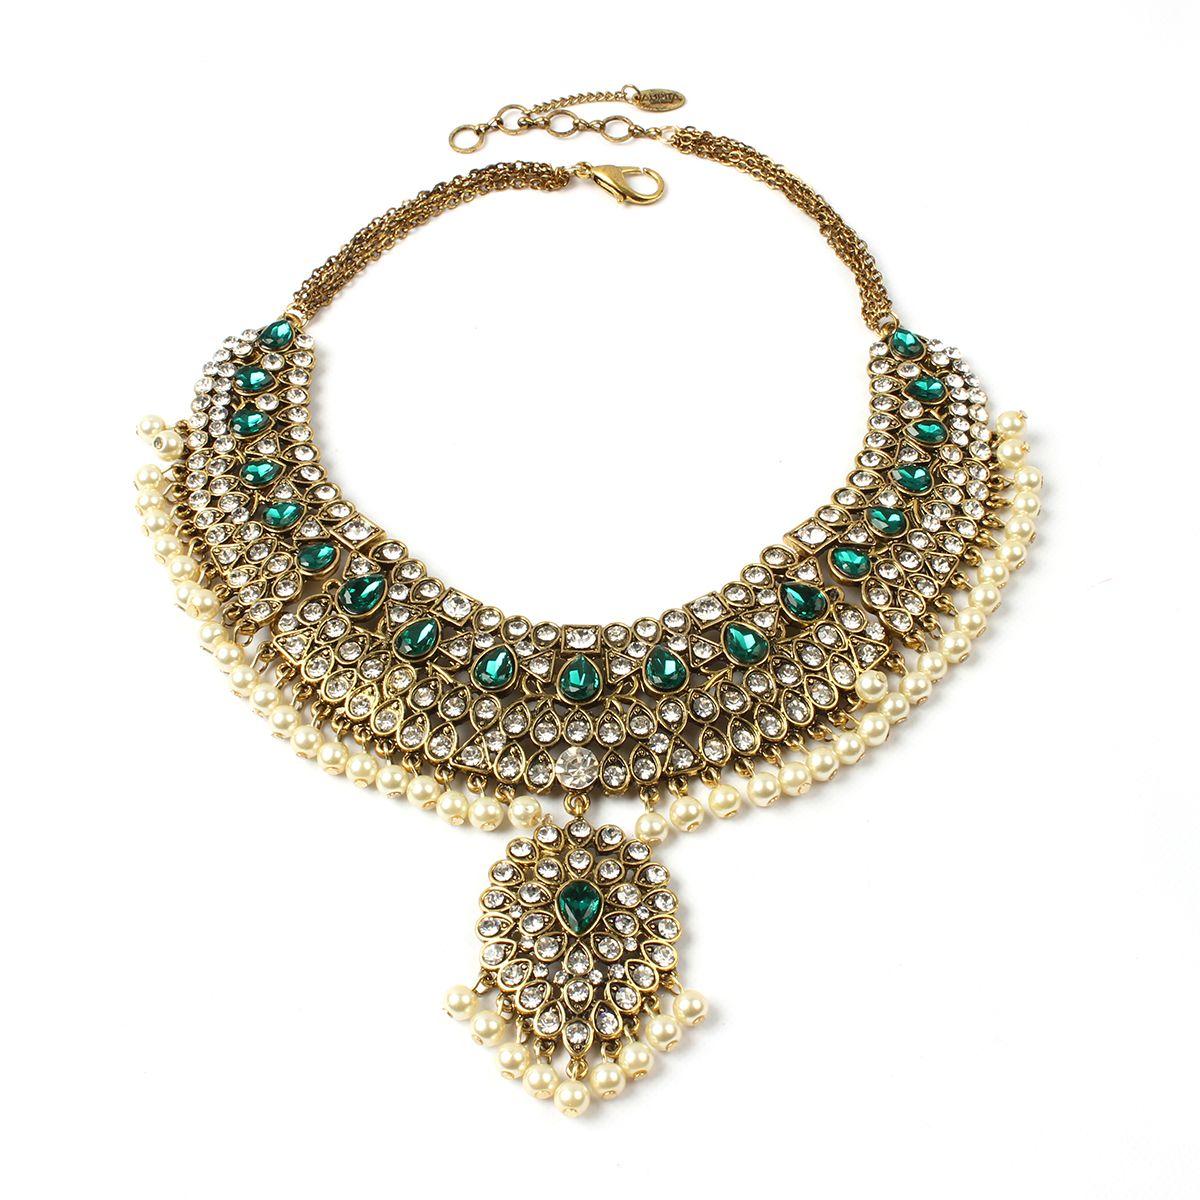 Heena necklace amrita singh austrian crystal and antique gold